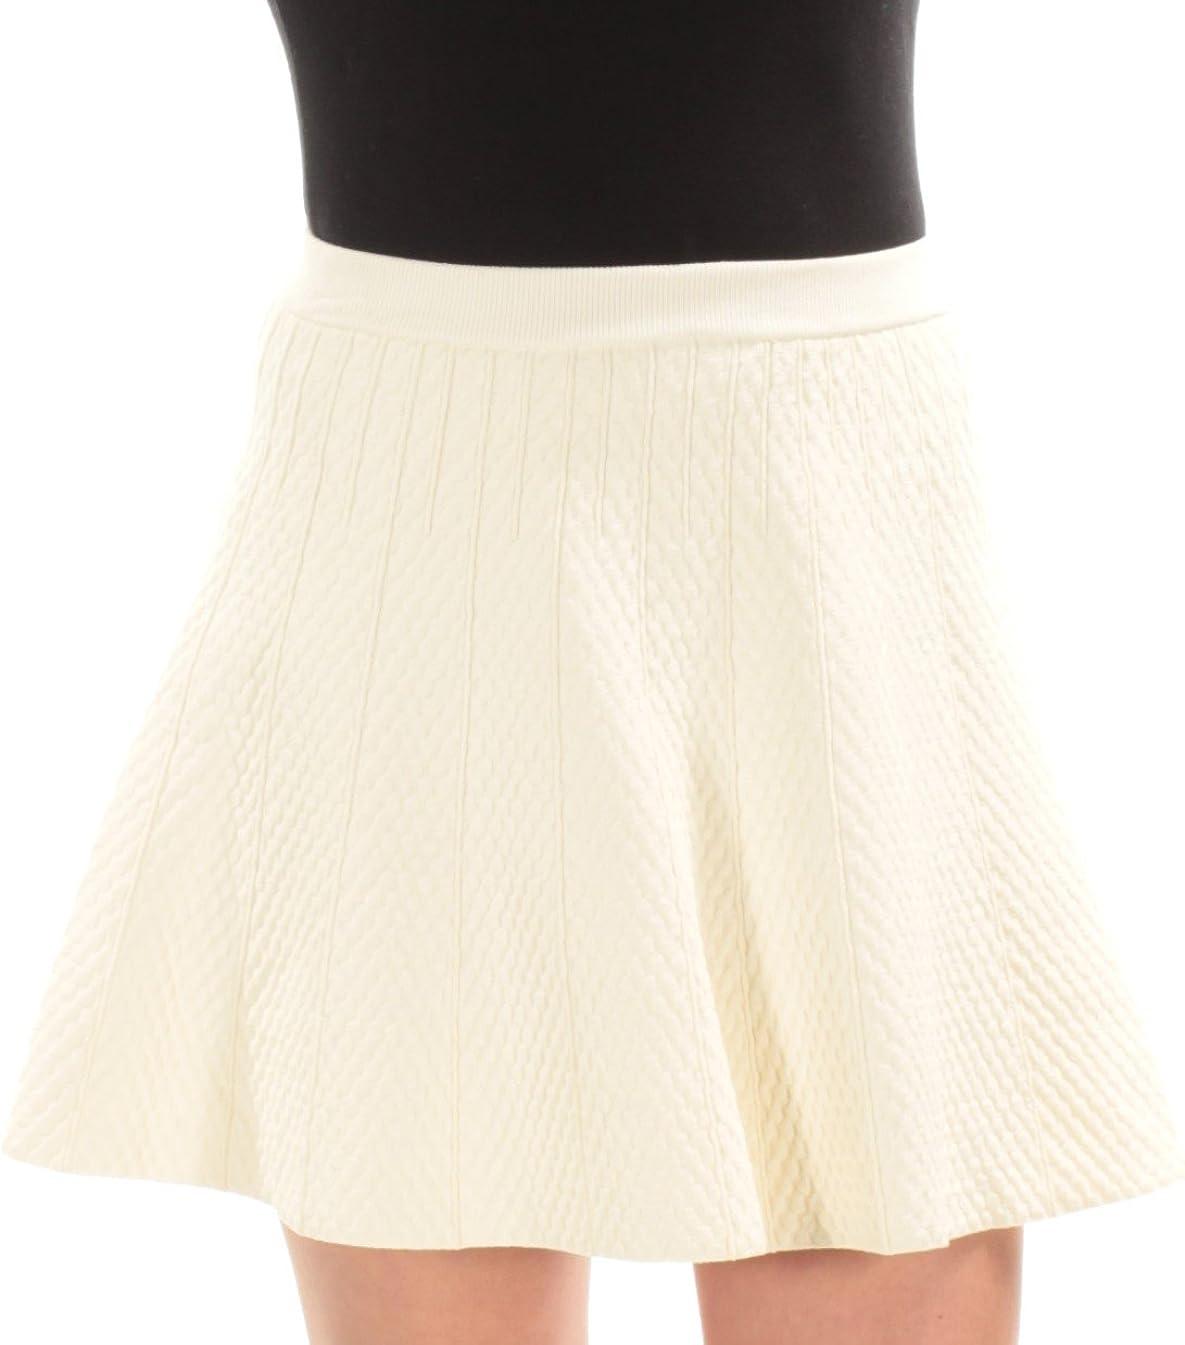 Rachel Roy $99 Womens New 1069 Ivory Textured Above The Knee A-Line Skirt XS B+B